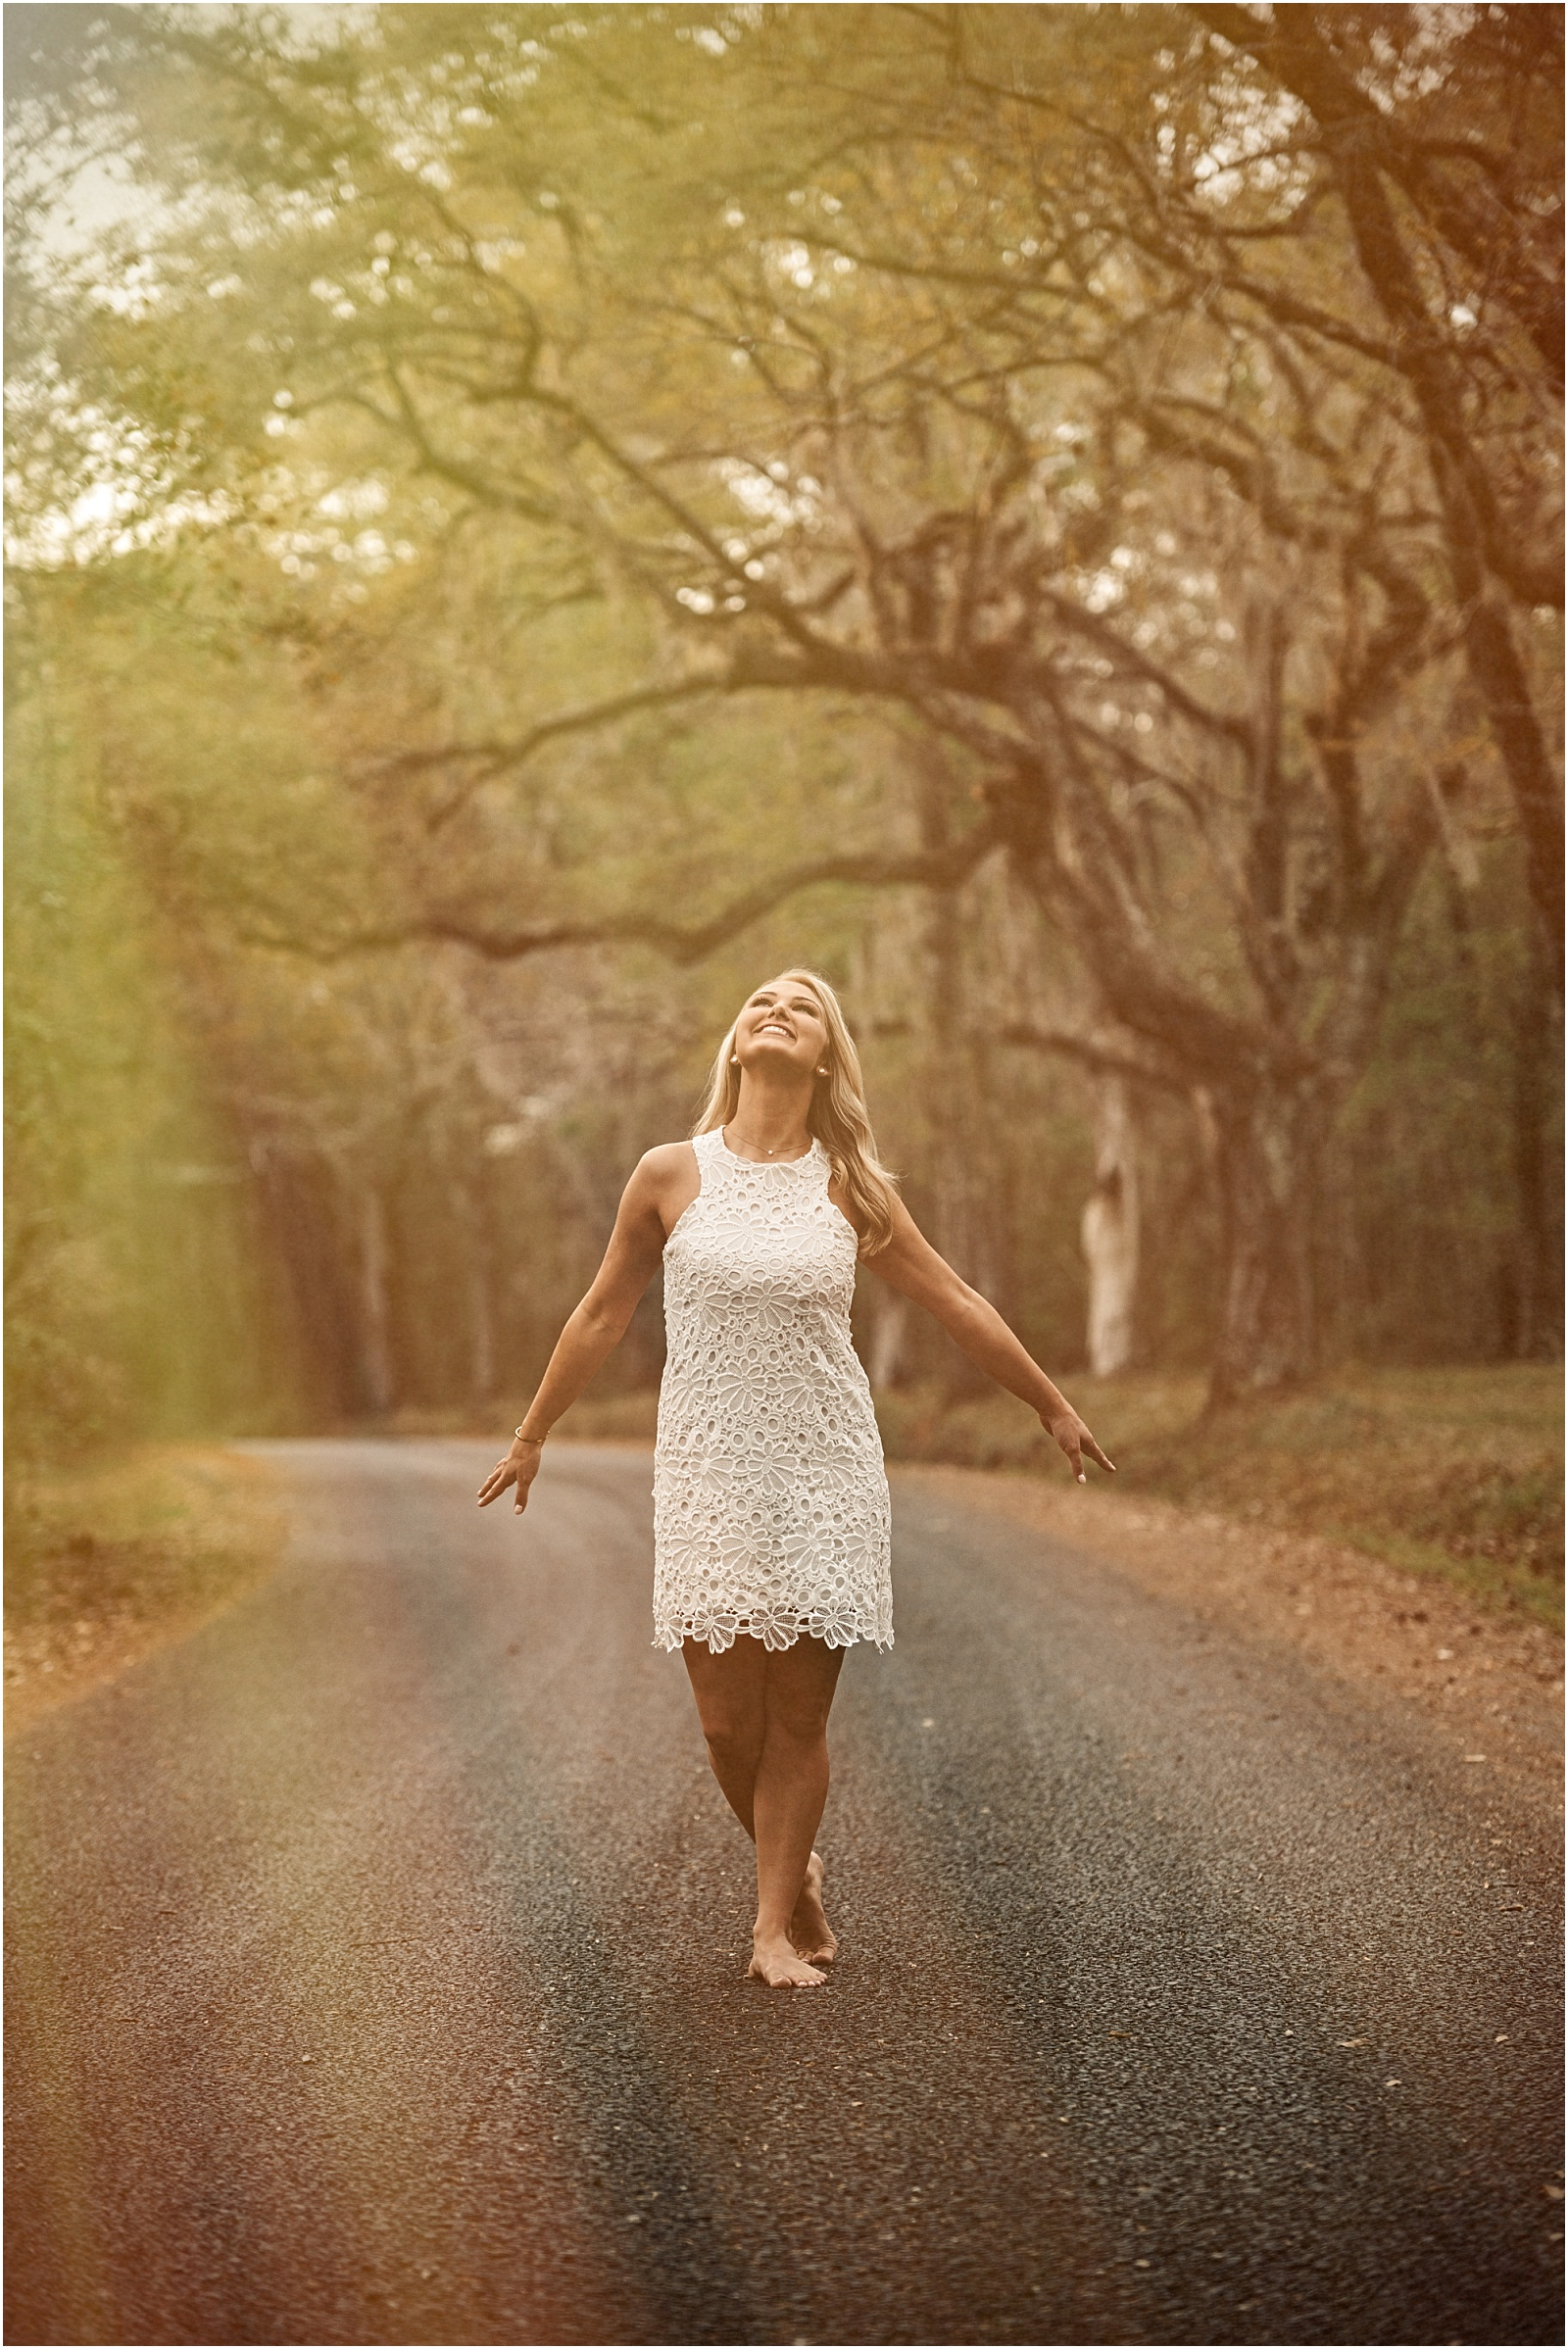 Tallahassee Senior Portrait Session White Lace Dress